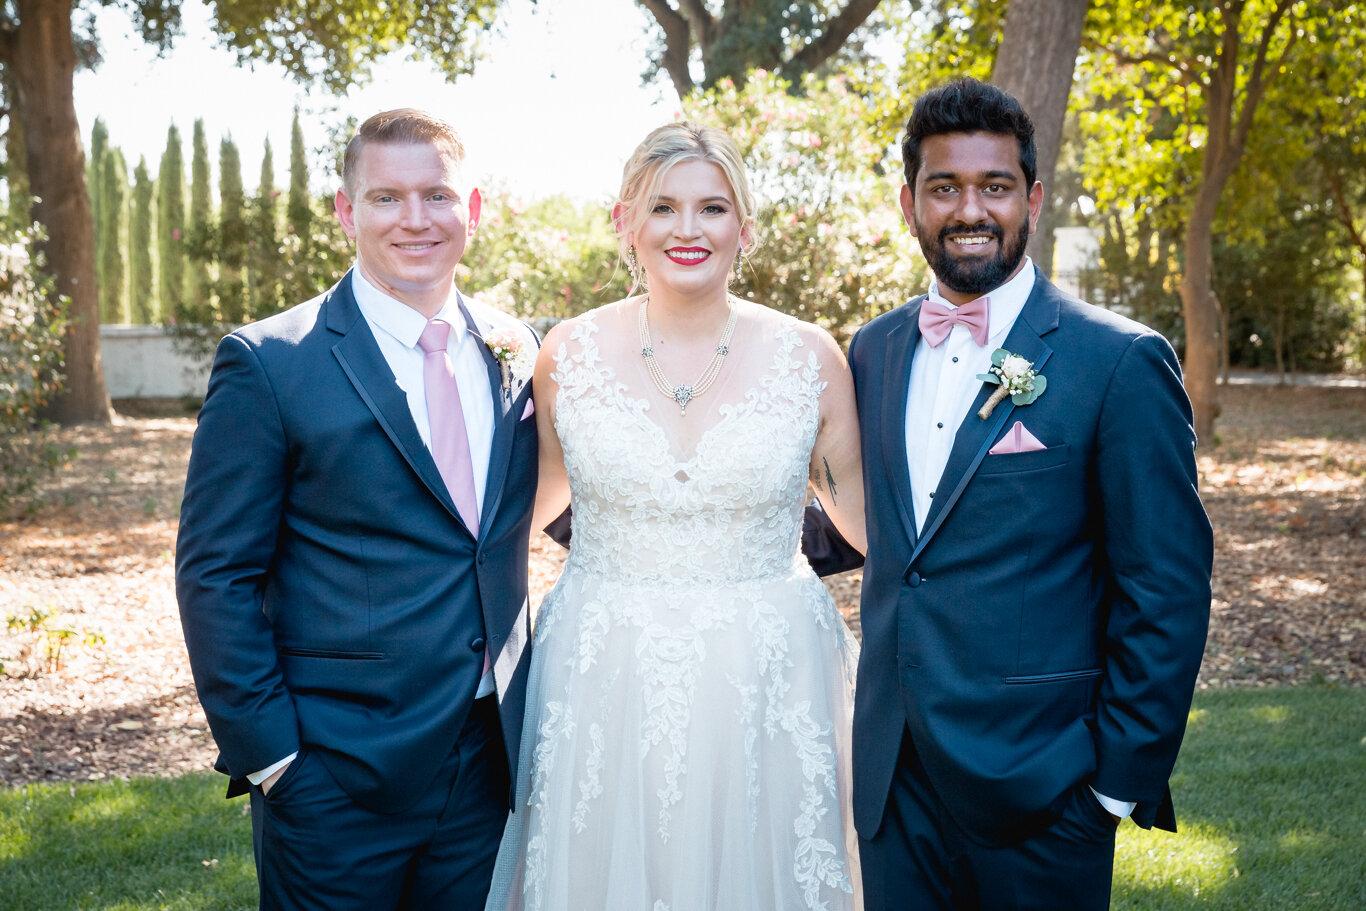 2019.08.24_Emily-Ashir-Wedding-at-the-Maples-5521.jpg